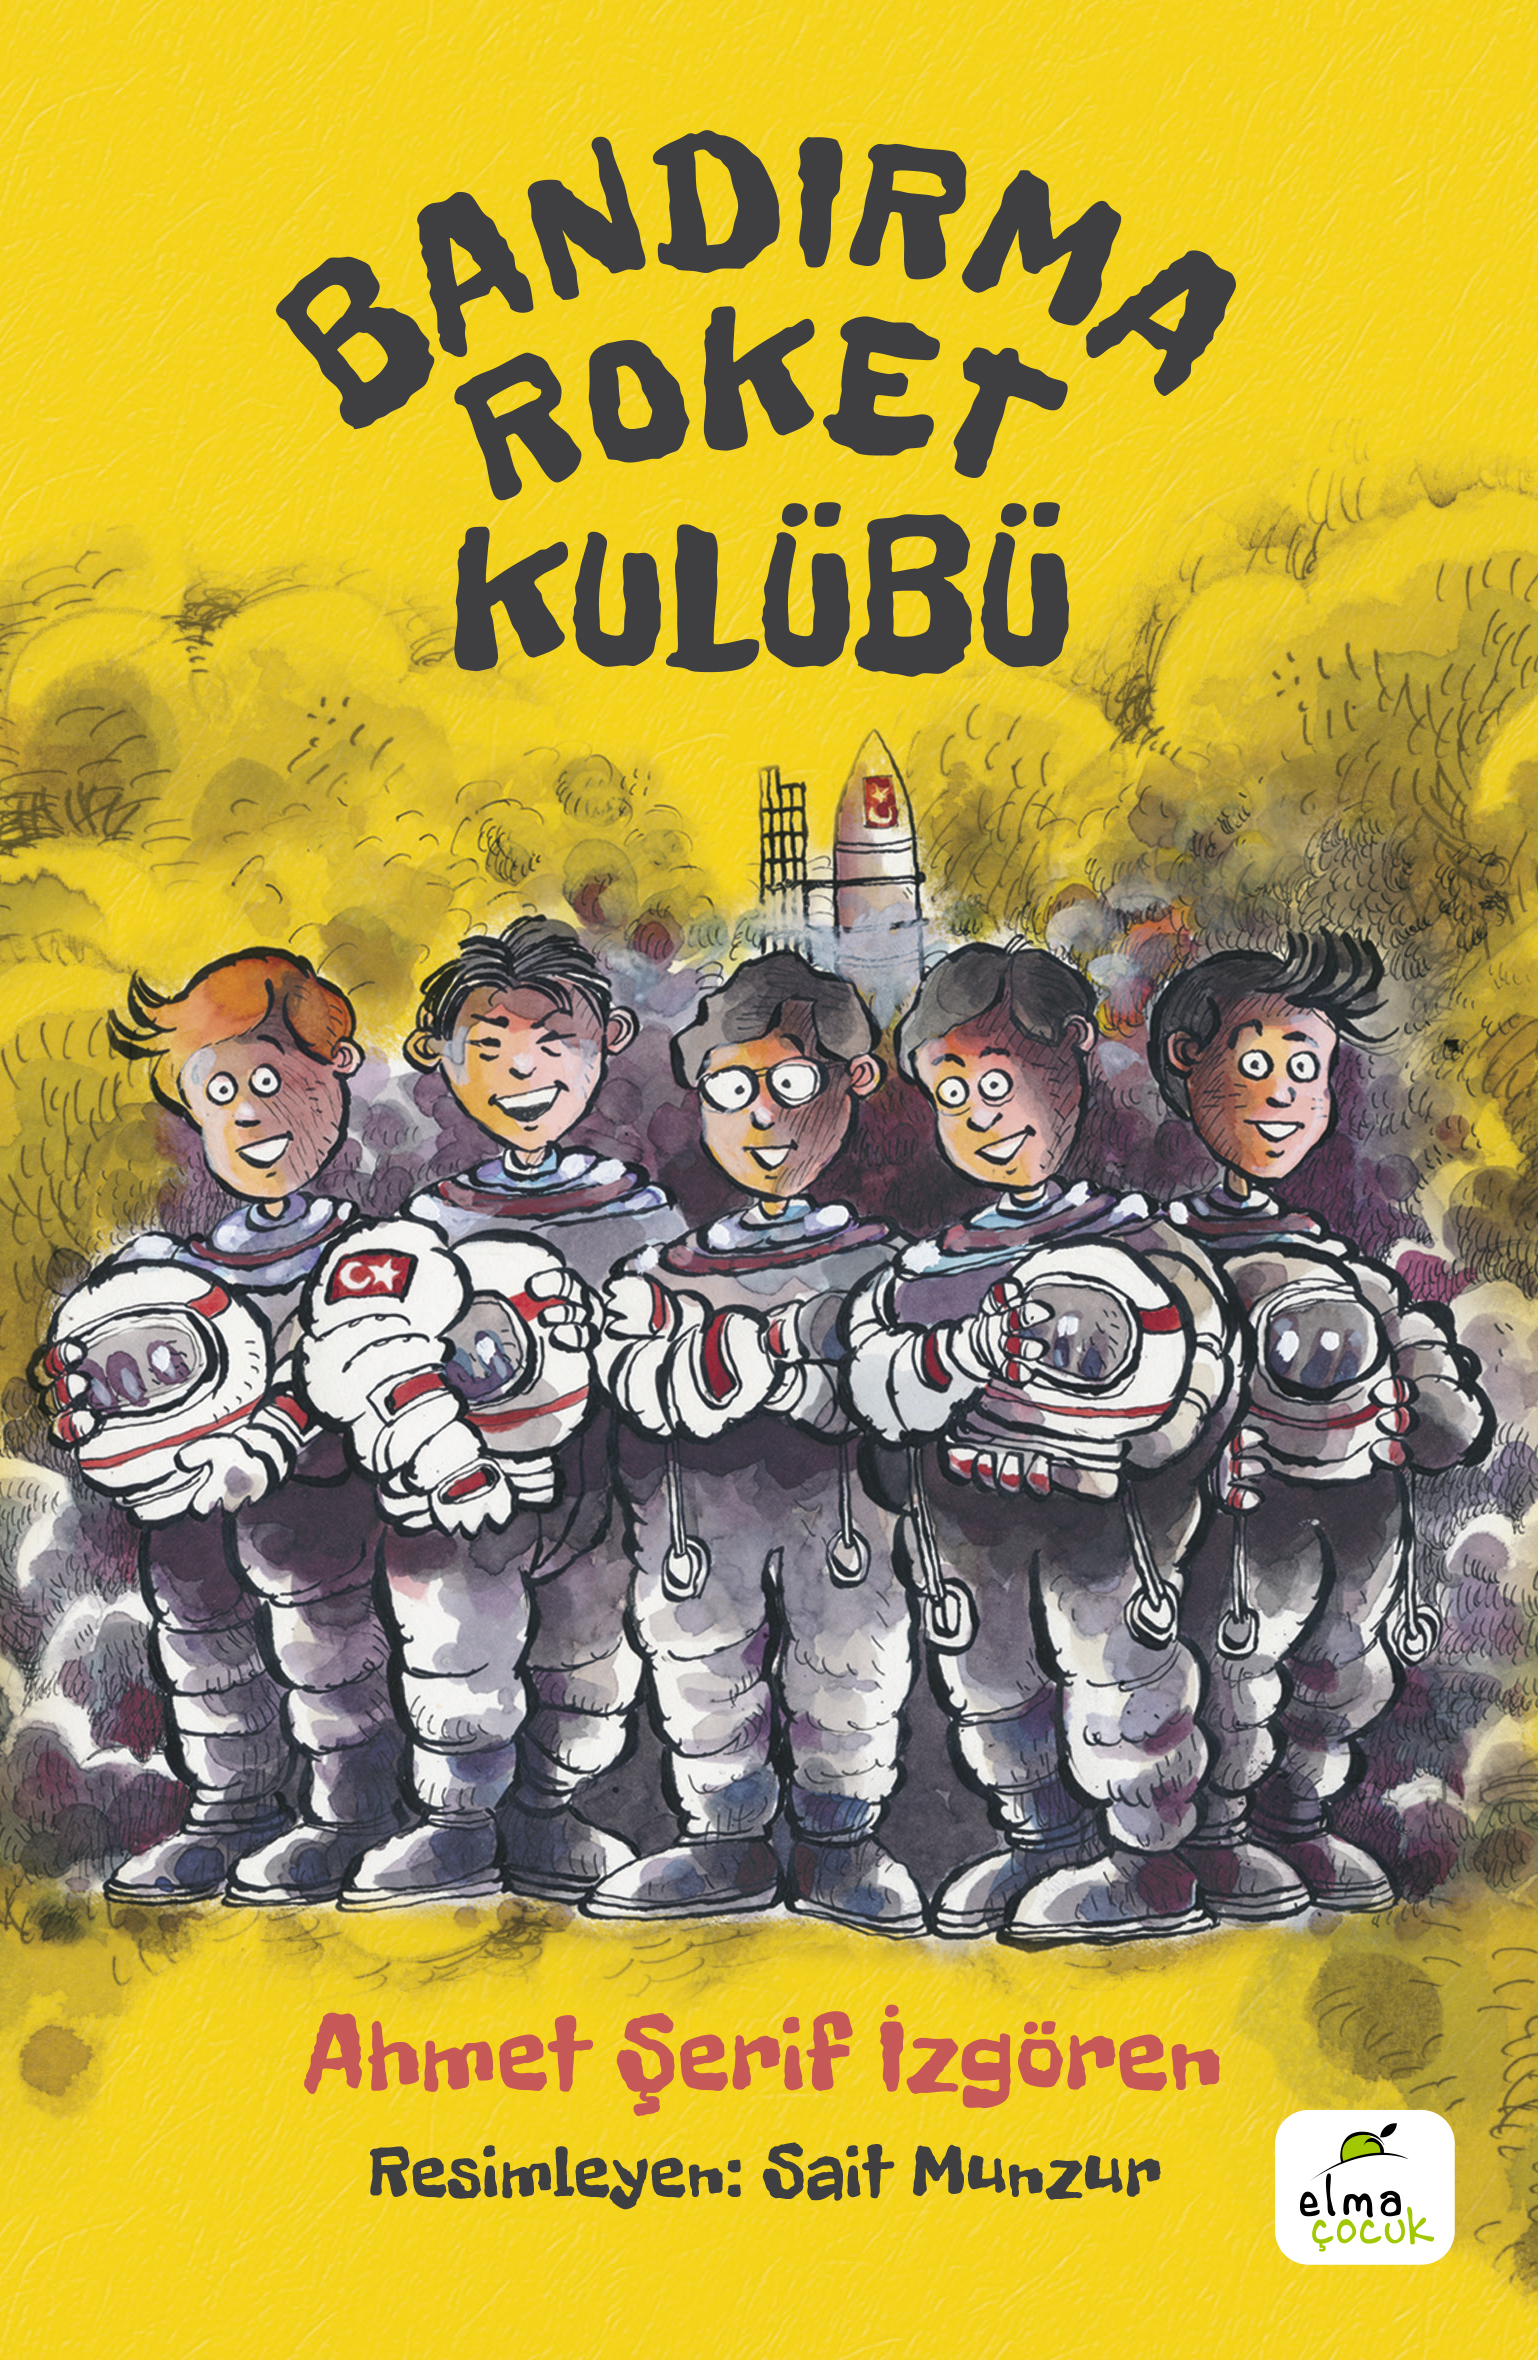 Bandırma Roket Kulübü